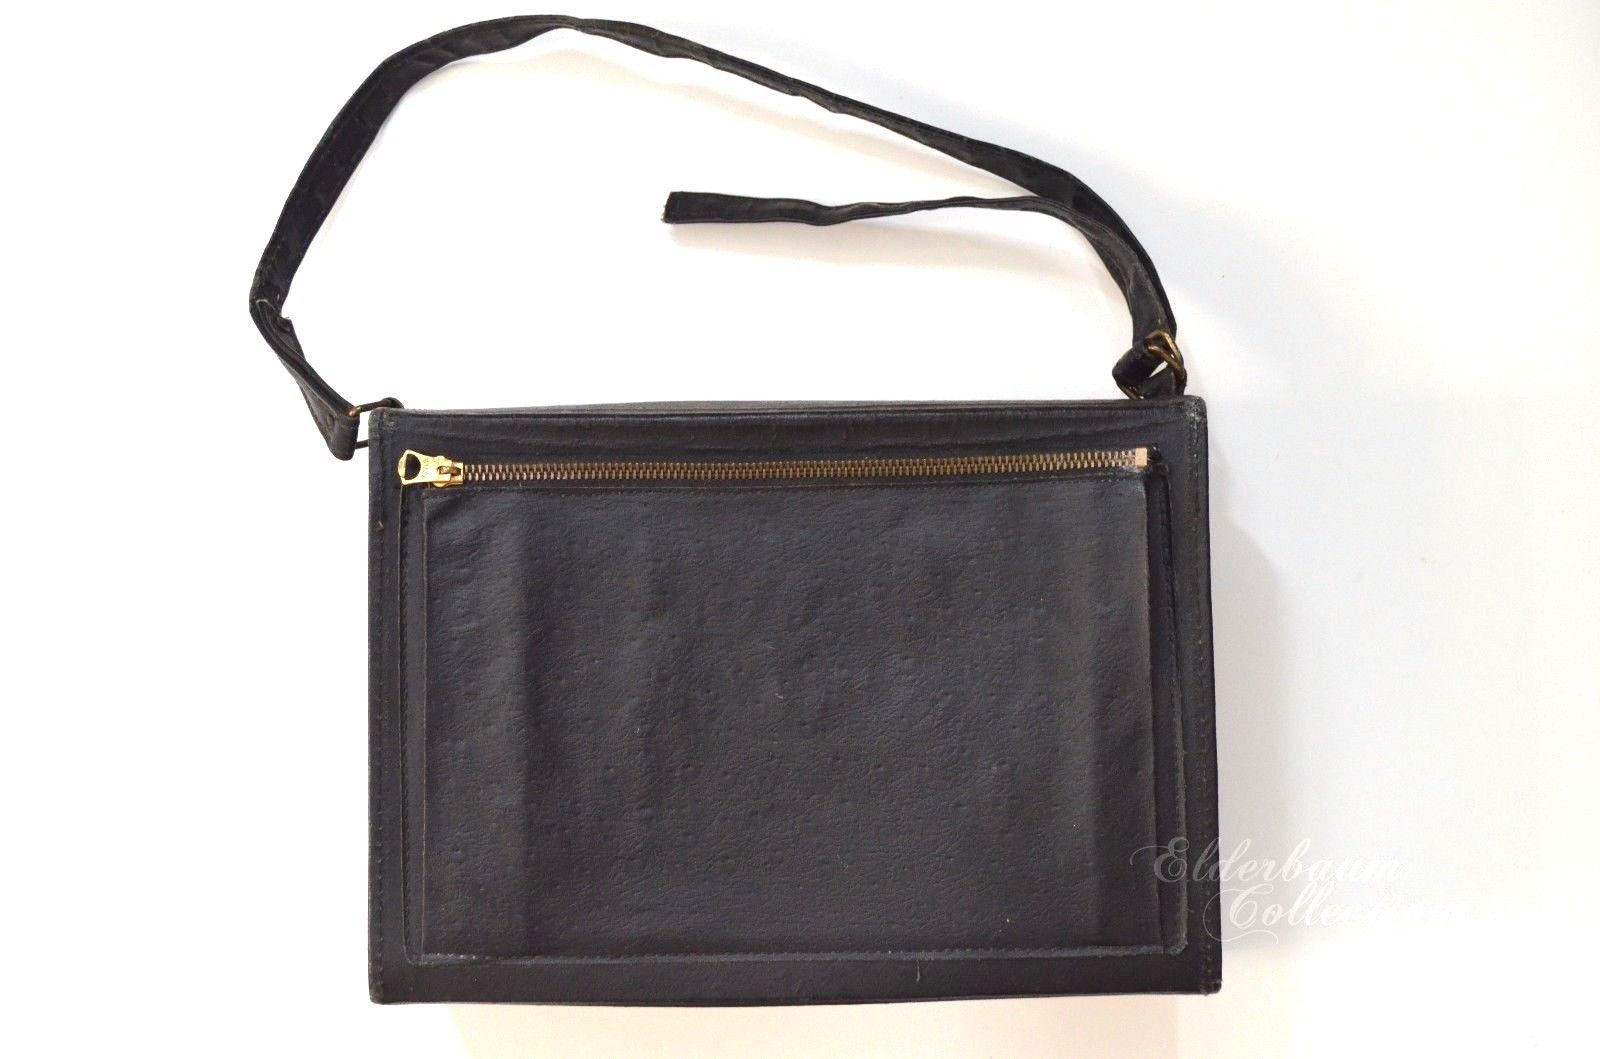 Tuck Tite Camera Bag Original 1940s 1950s Vintage Purse Brass NYNCO Zipper